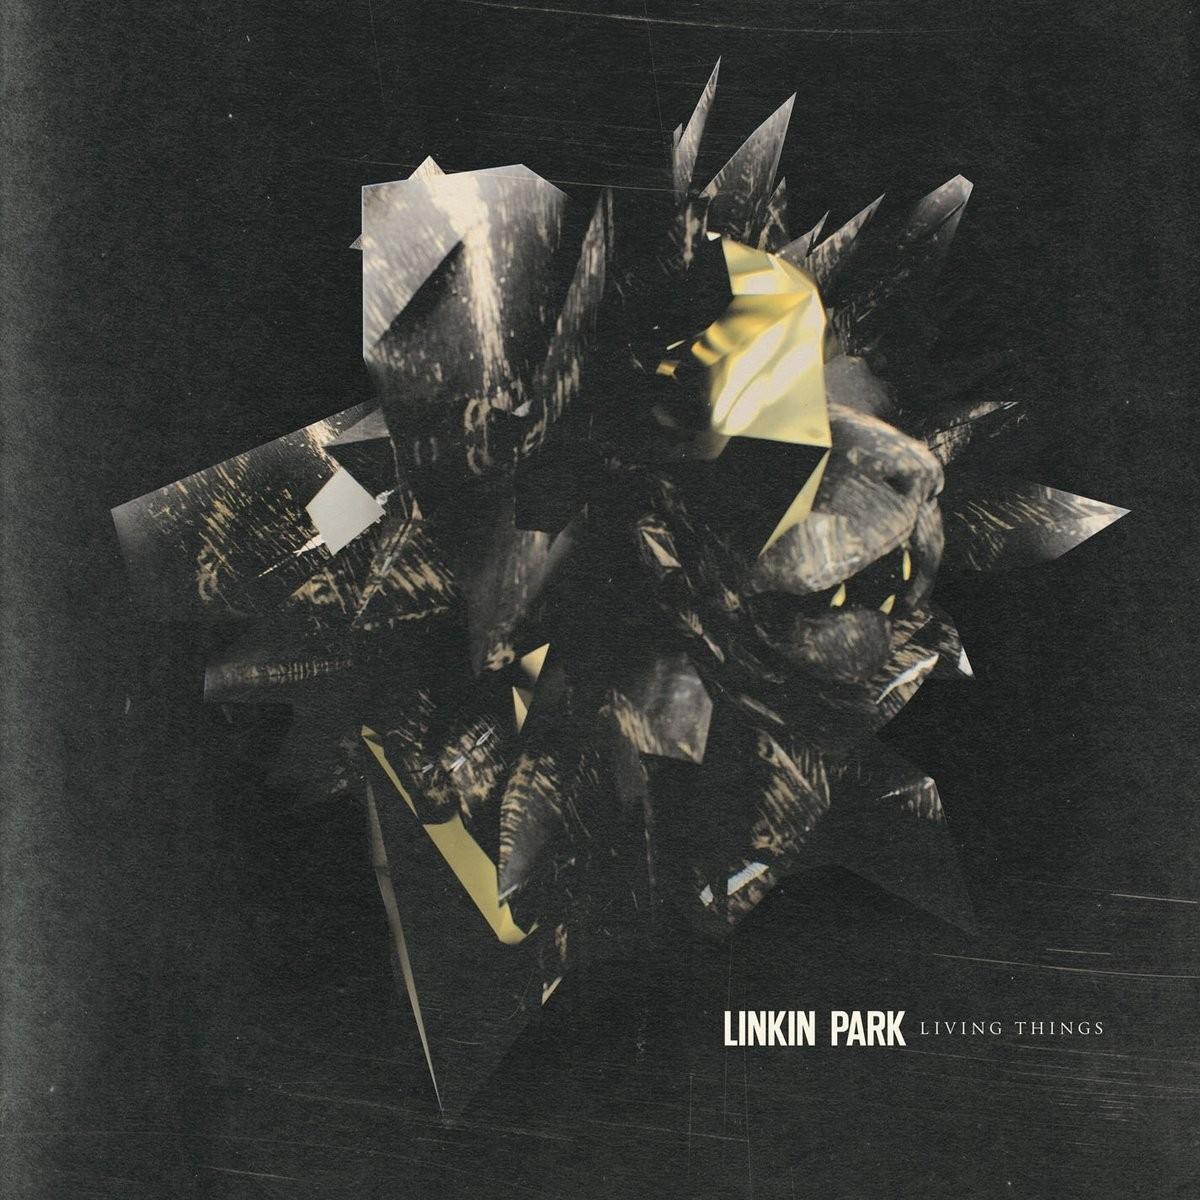 Linkin Park - Living Things LP